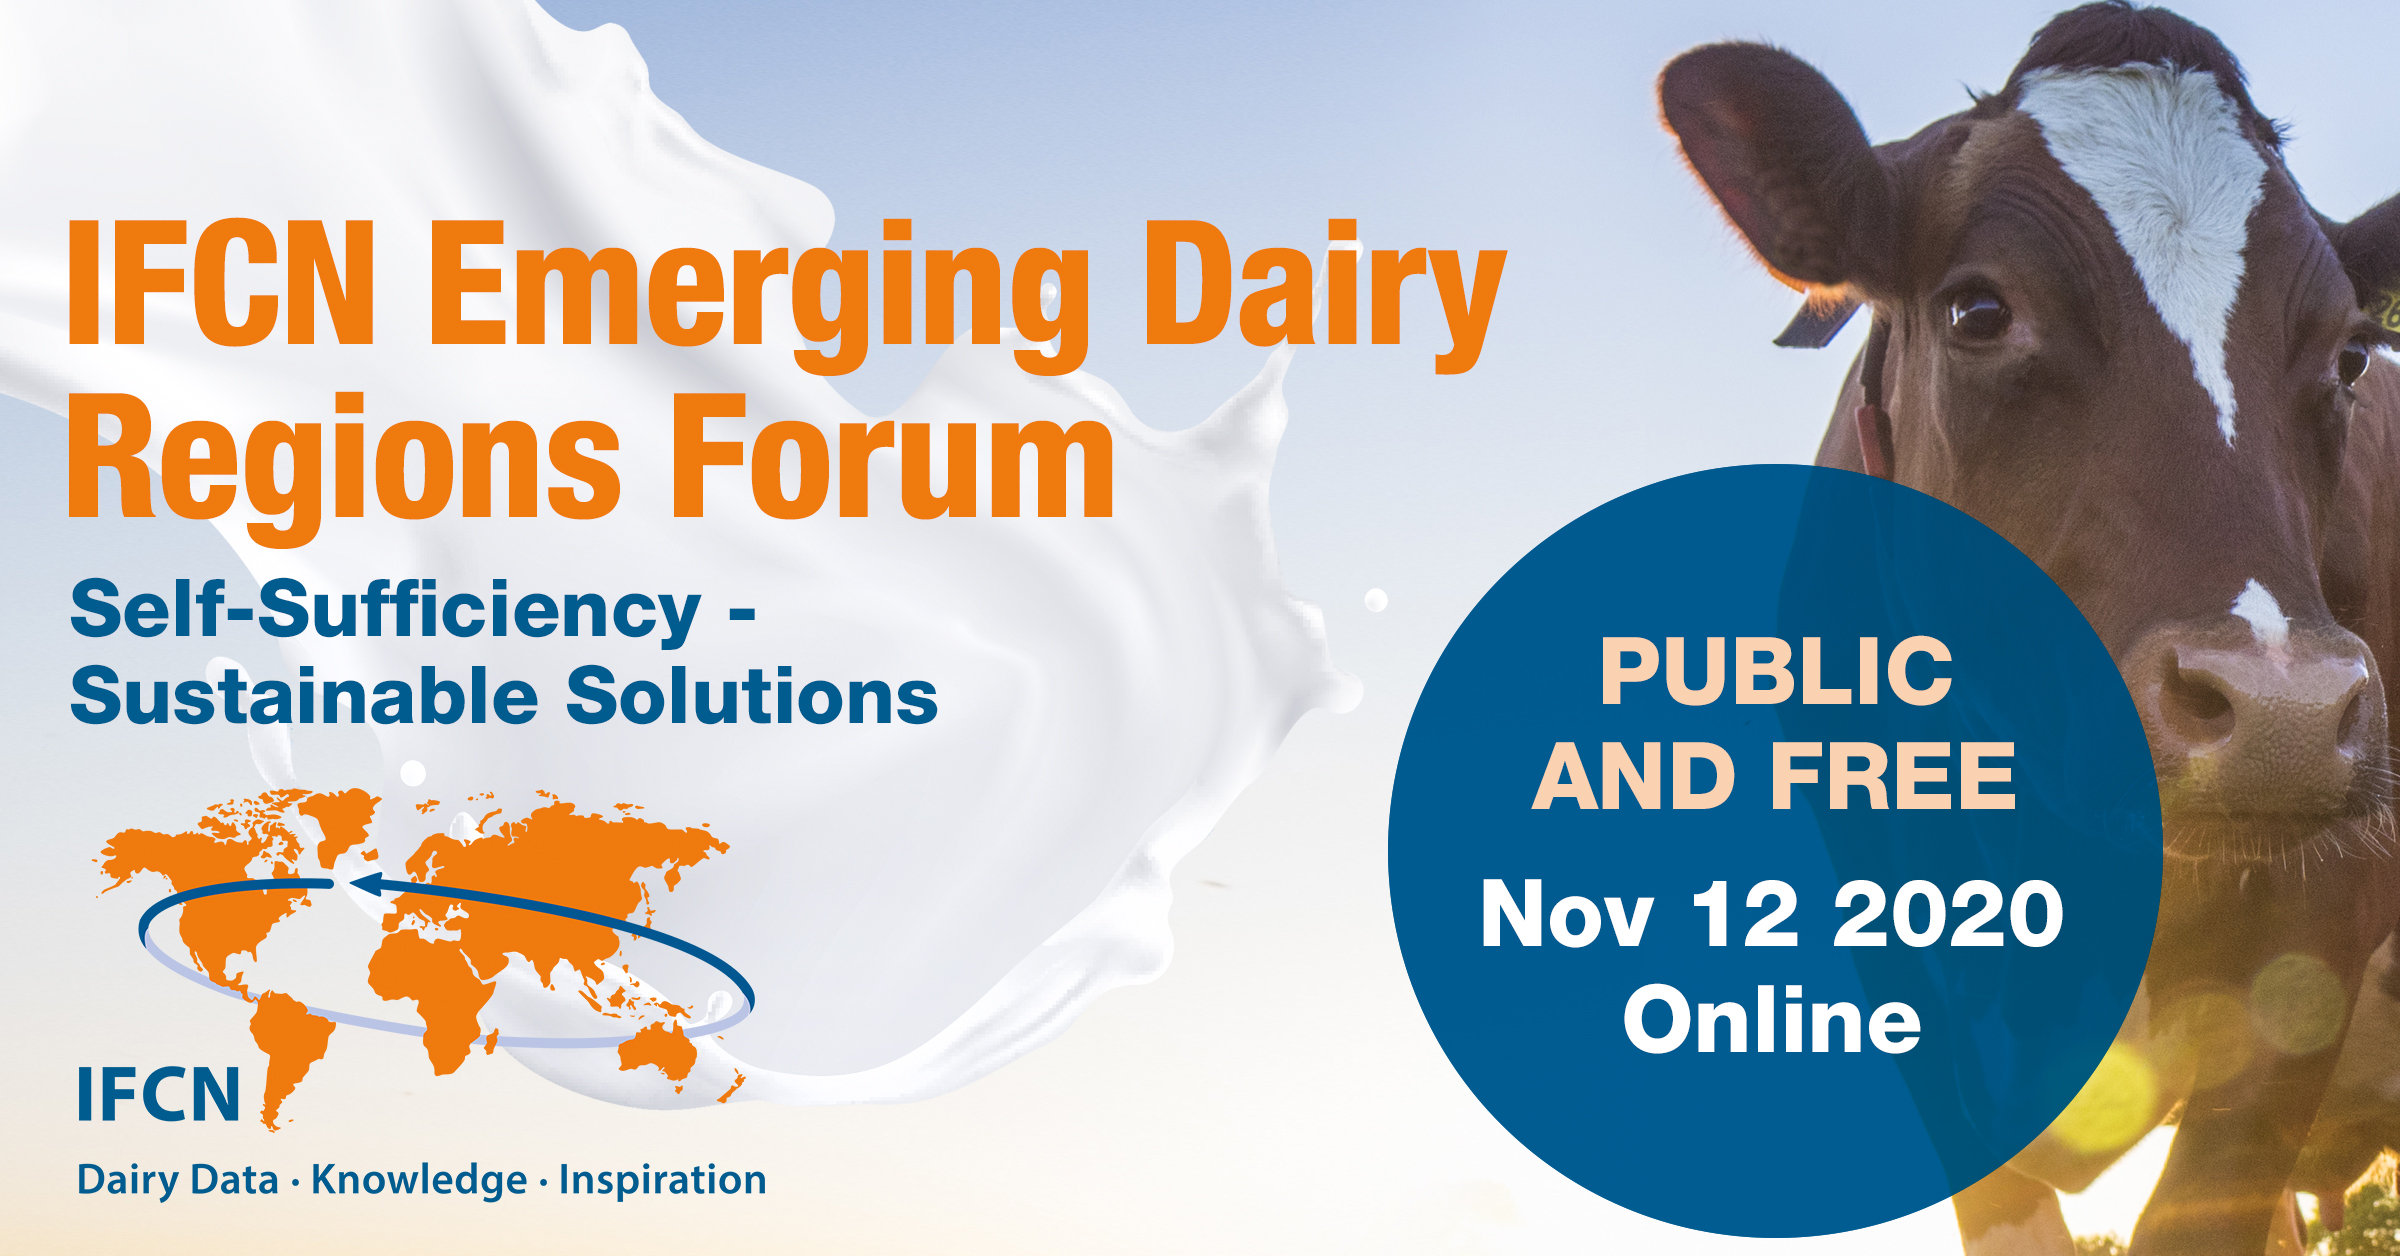 IFCN Emerging Dairy Regions Forum